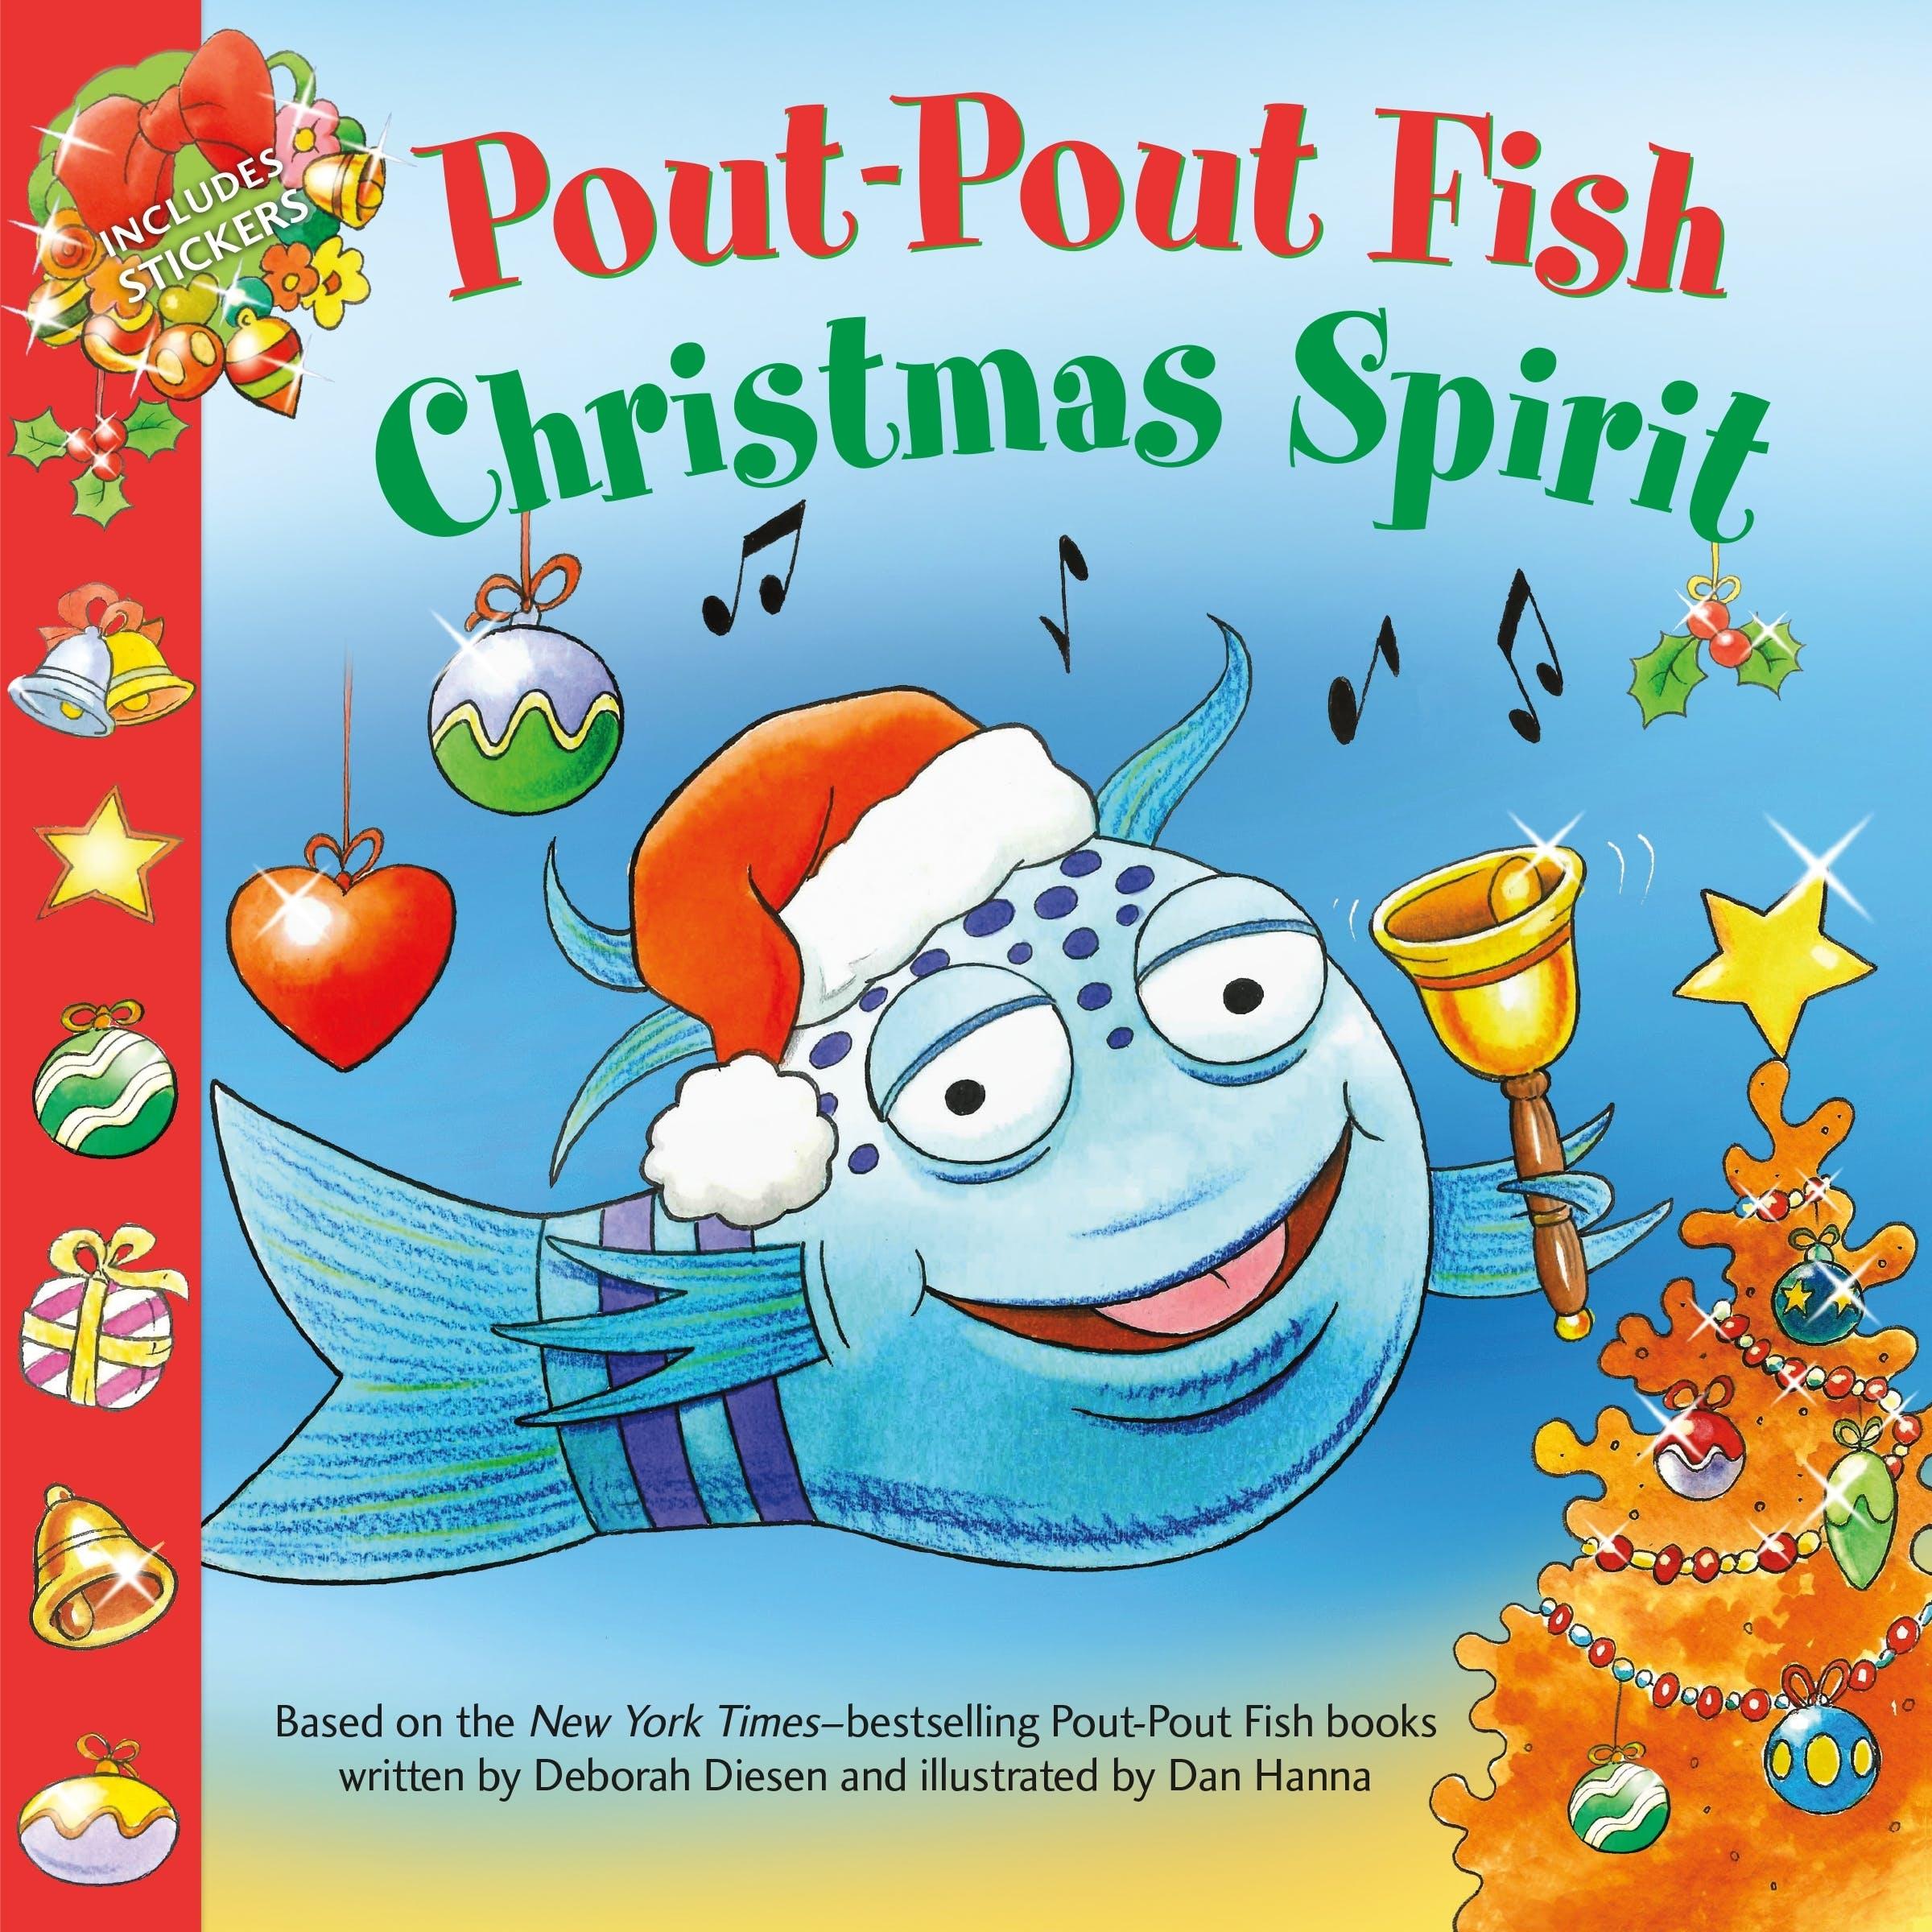 Image of Pout-Pout Fish: Christmas Spirit